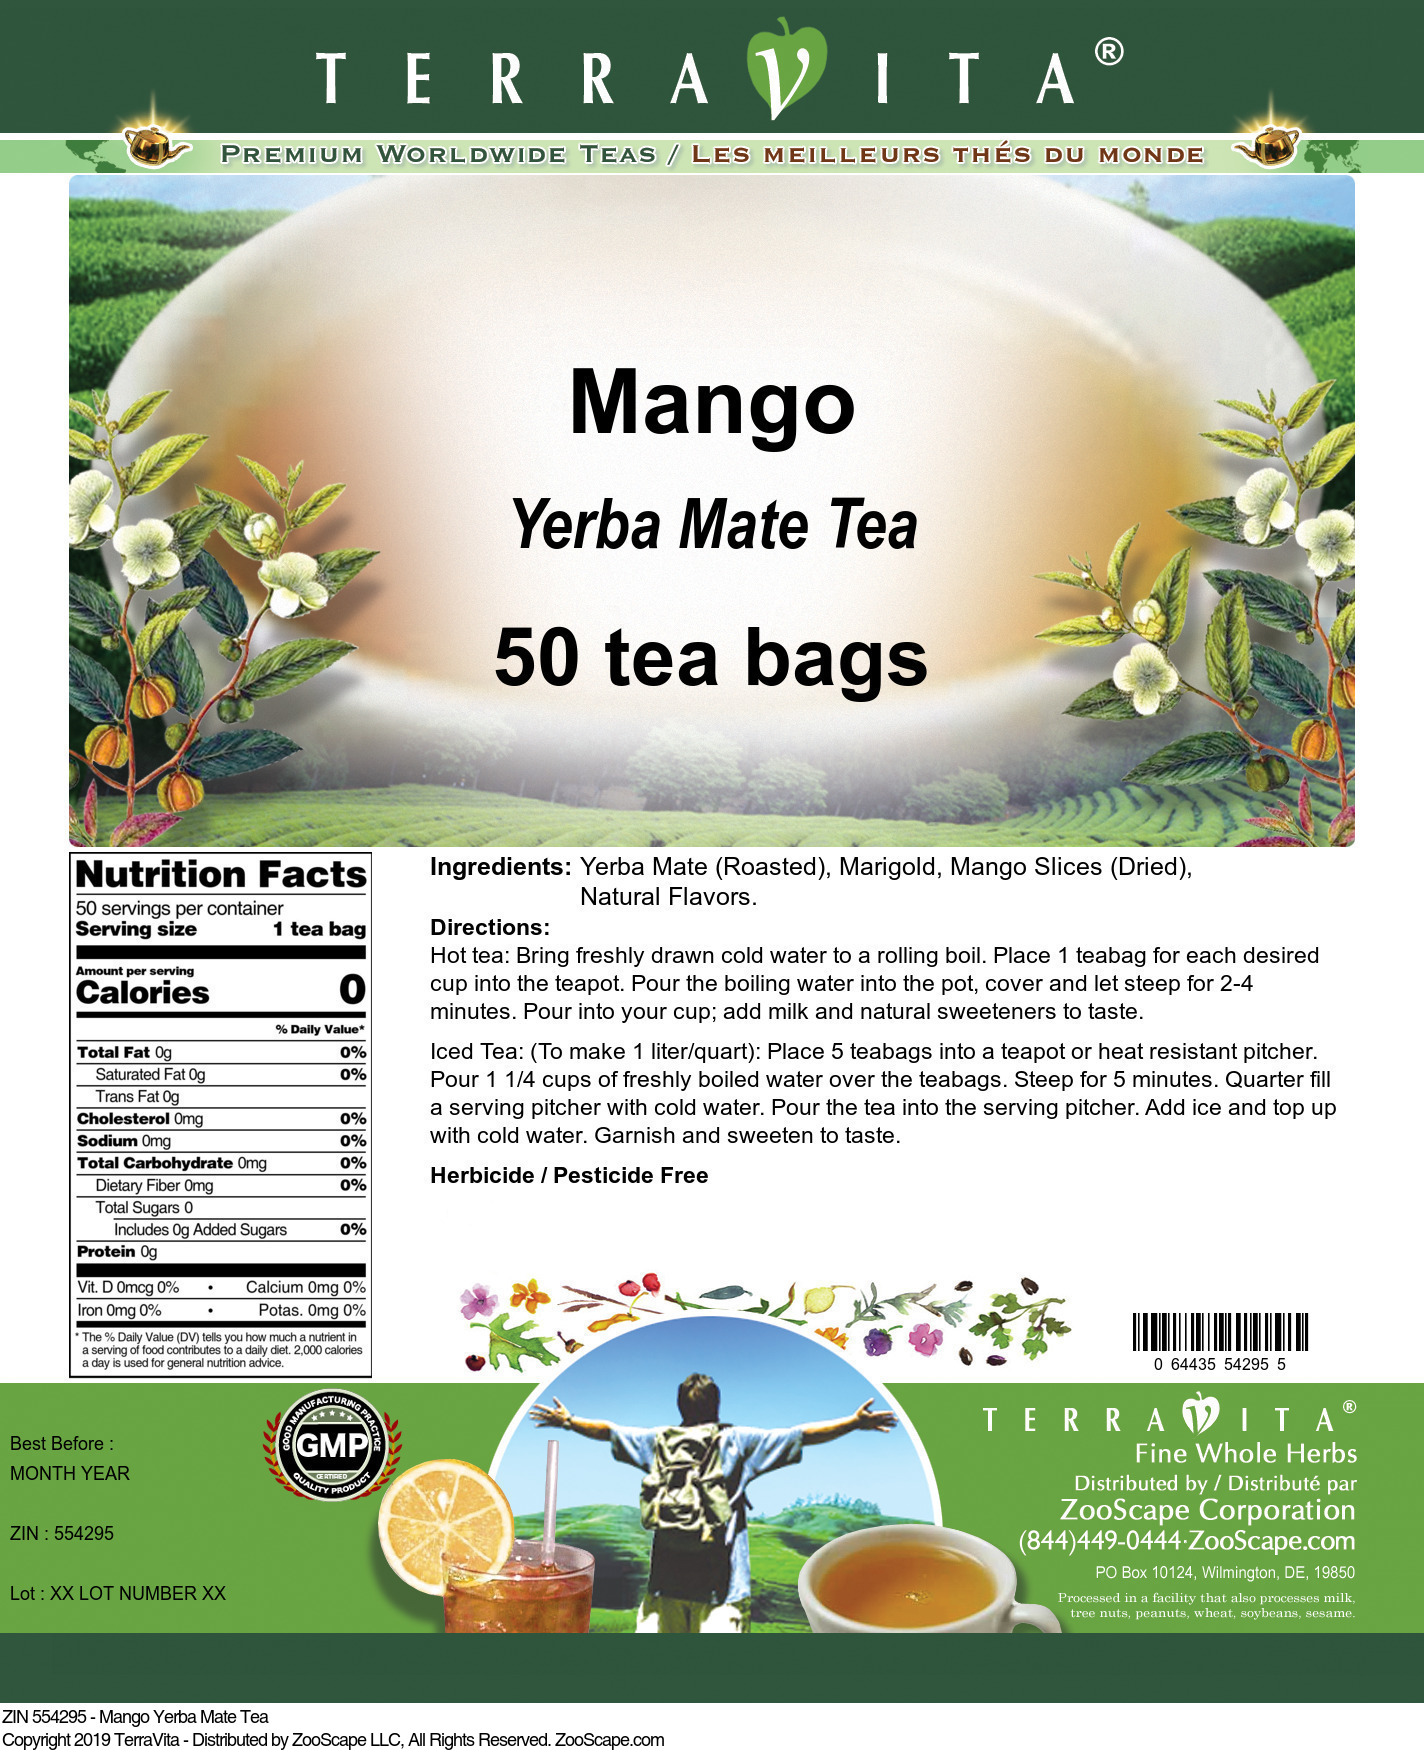 Mango Yerba Mate Tea